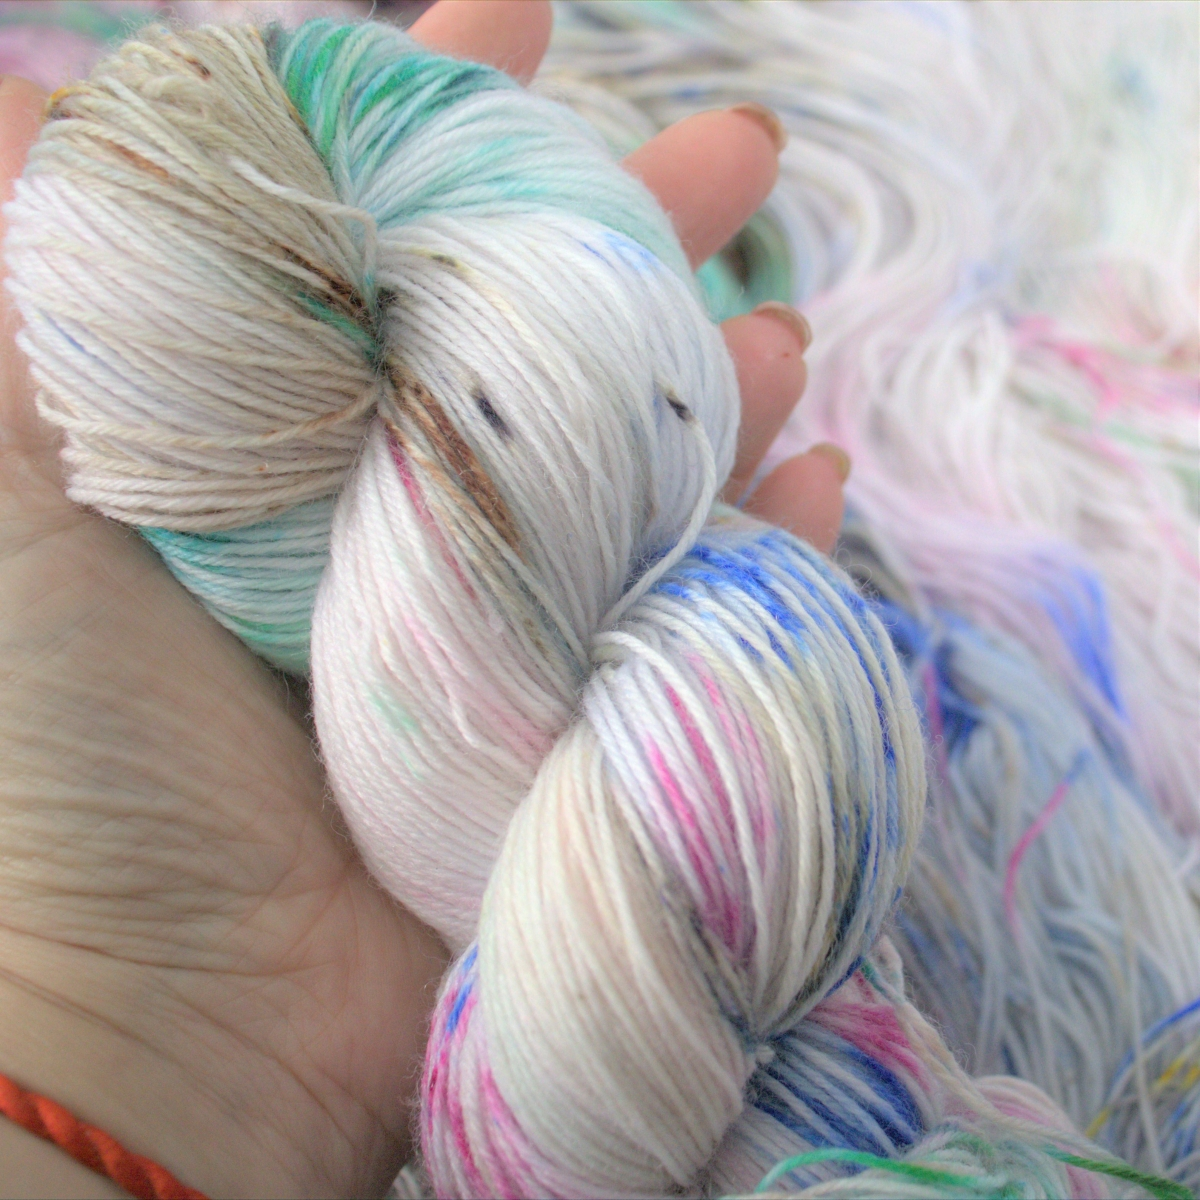 woodico.pro hand dyed yarn 047 copy 1 1200x1200 - Hand dyed yarn / 048